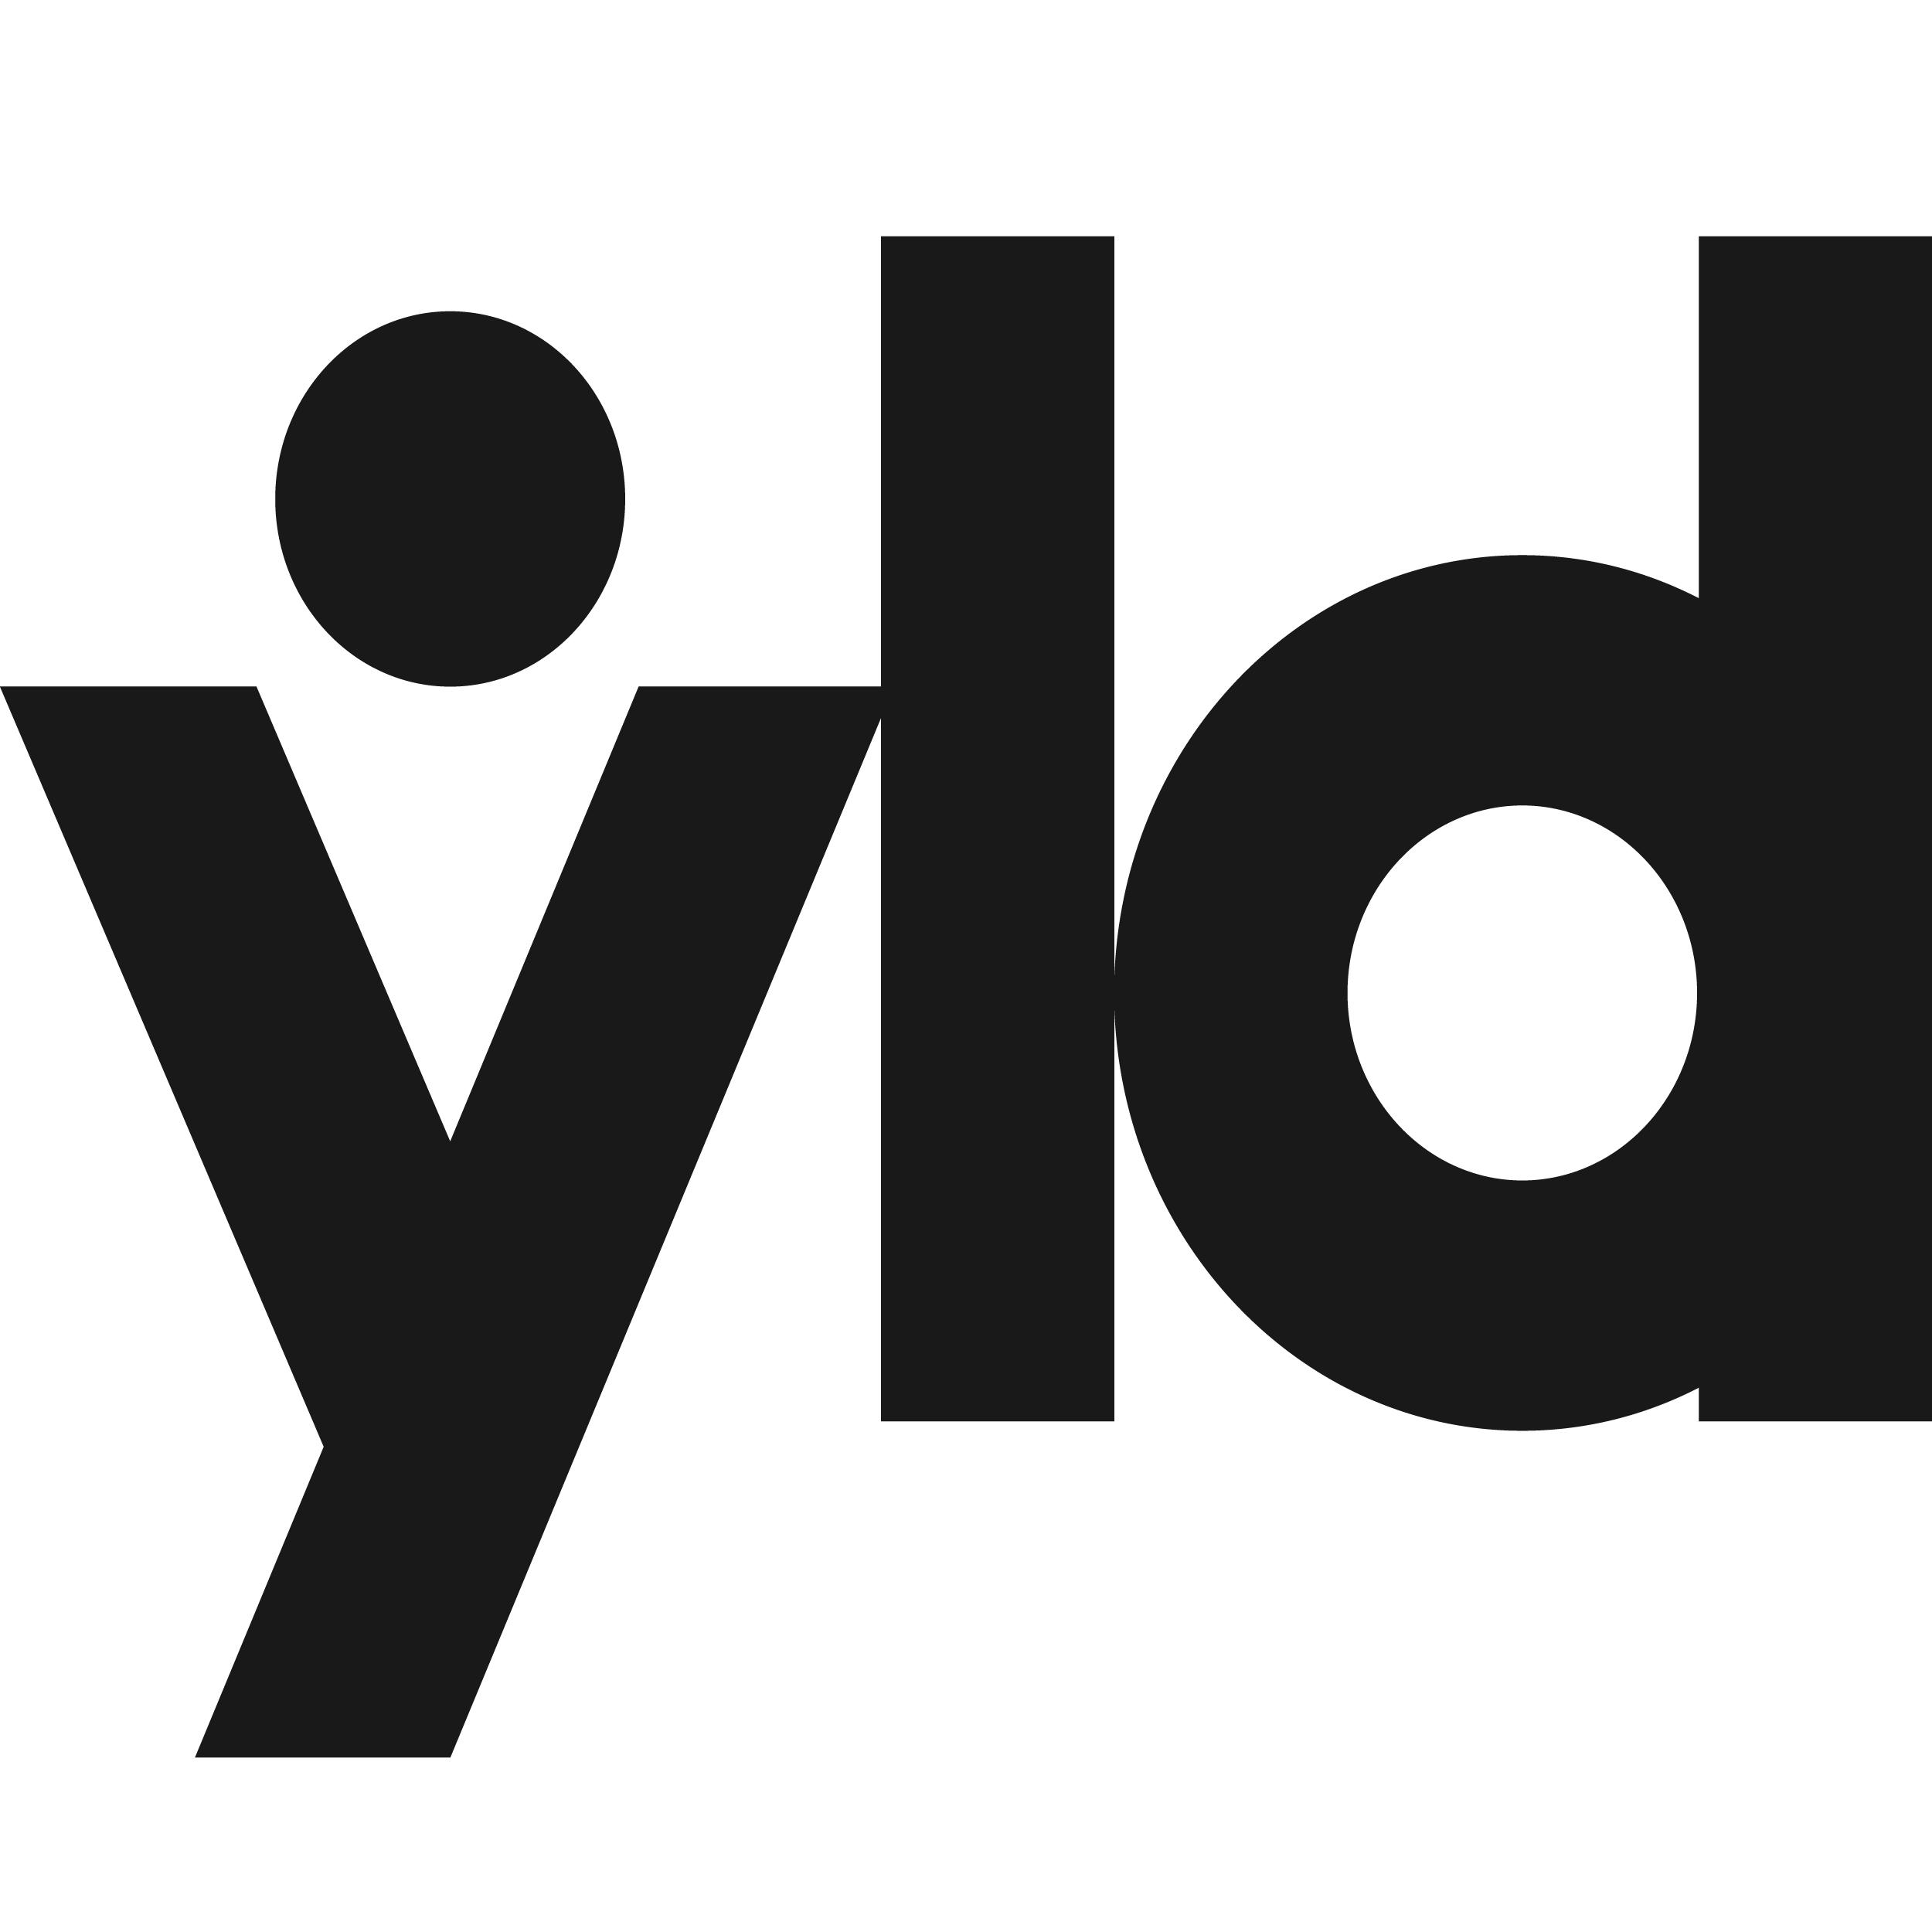 yld_logo new.jpg